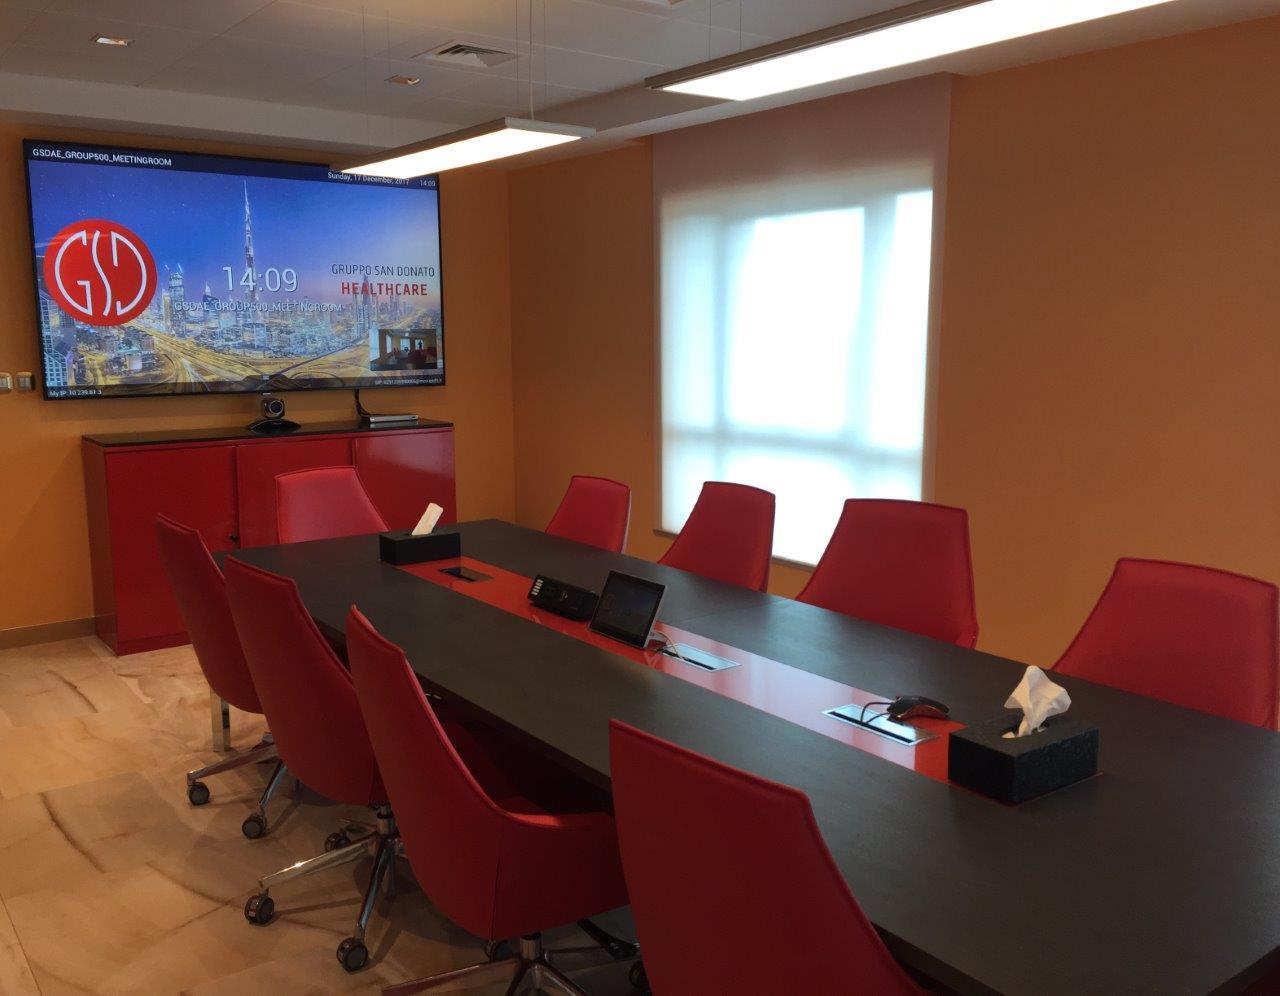 Lantech//Longwave con GSD Healthcare negli Emirati Arabi